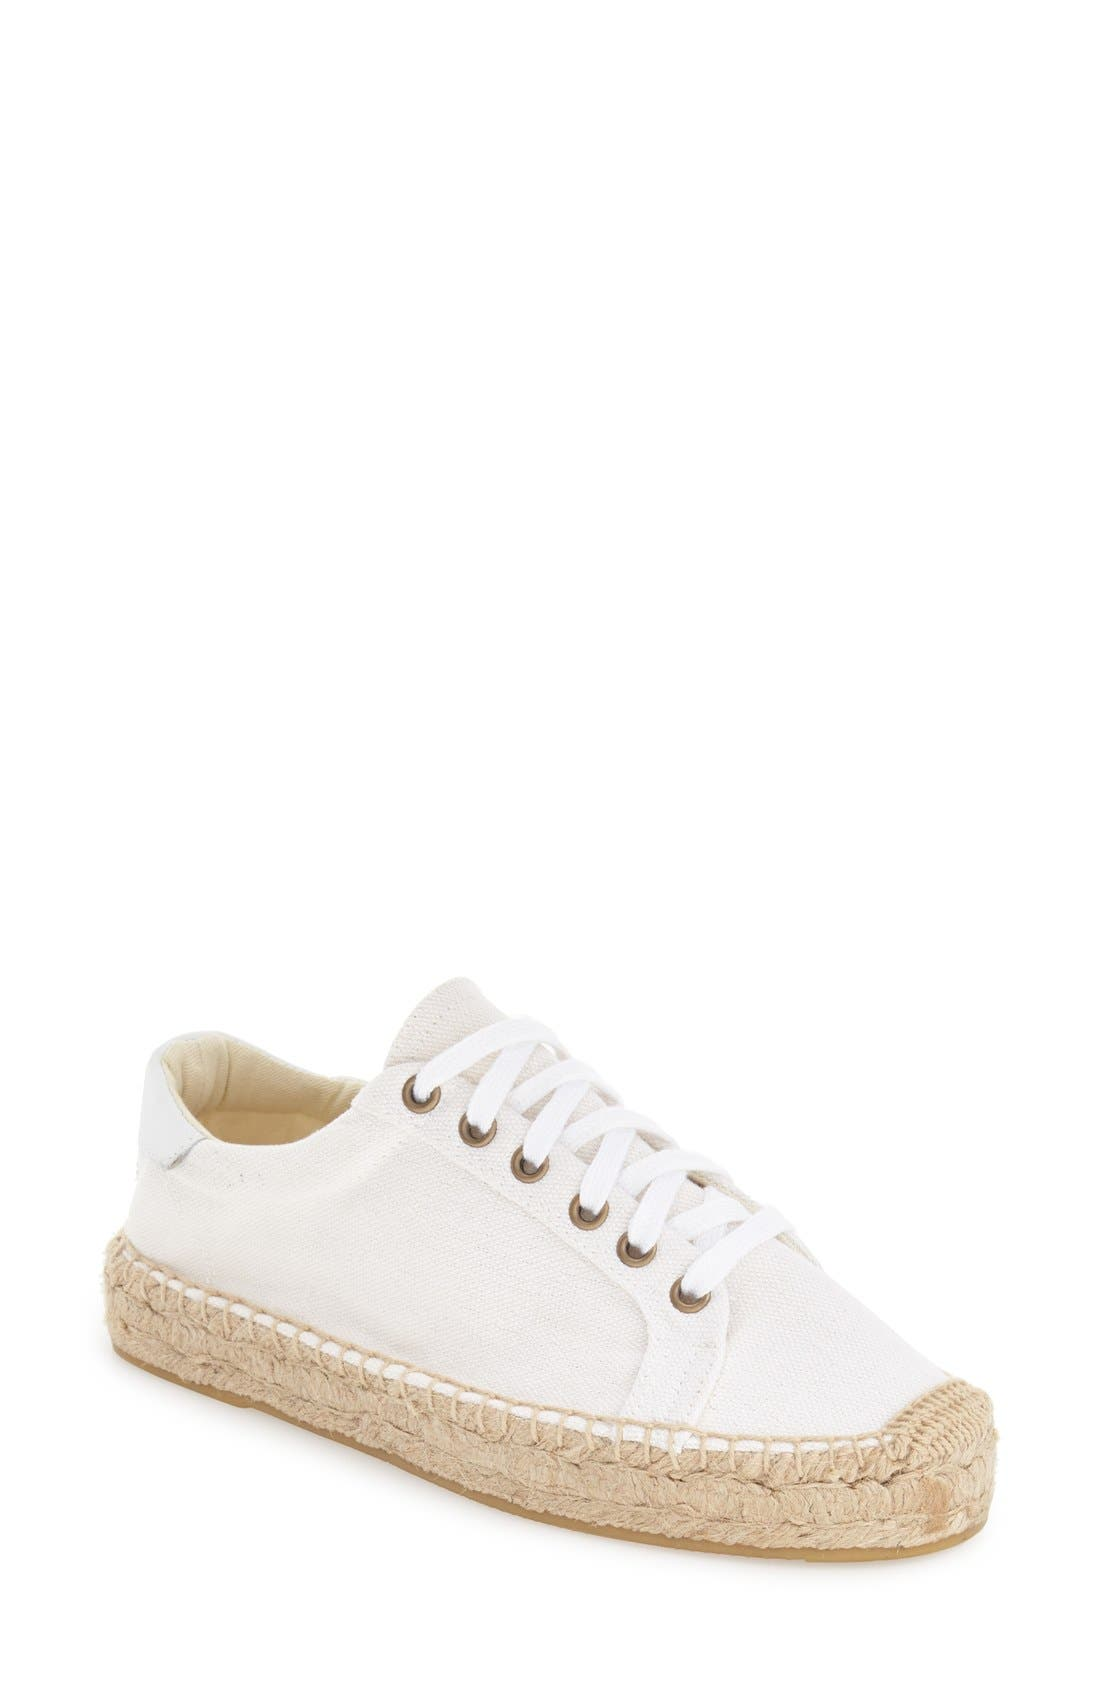 Espadrille Platform Sneaker,                         Main,                         color, 100